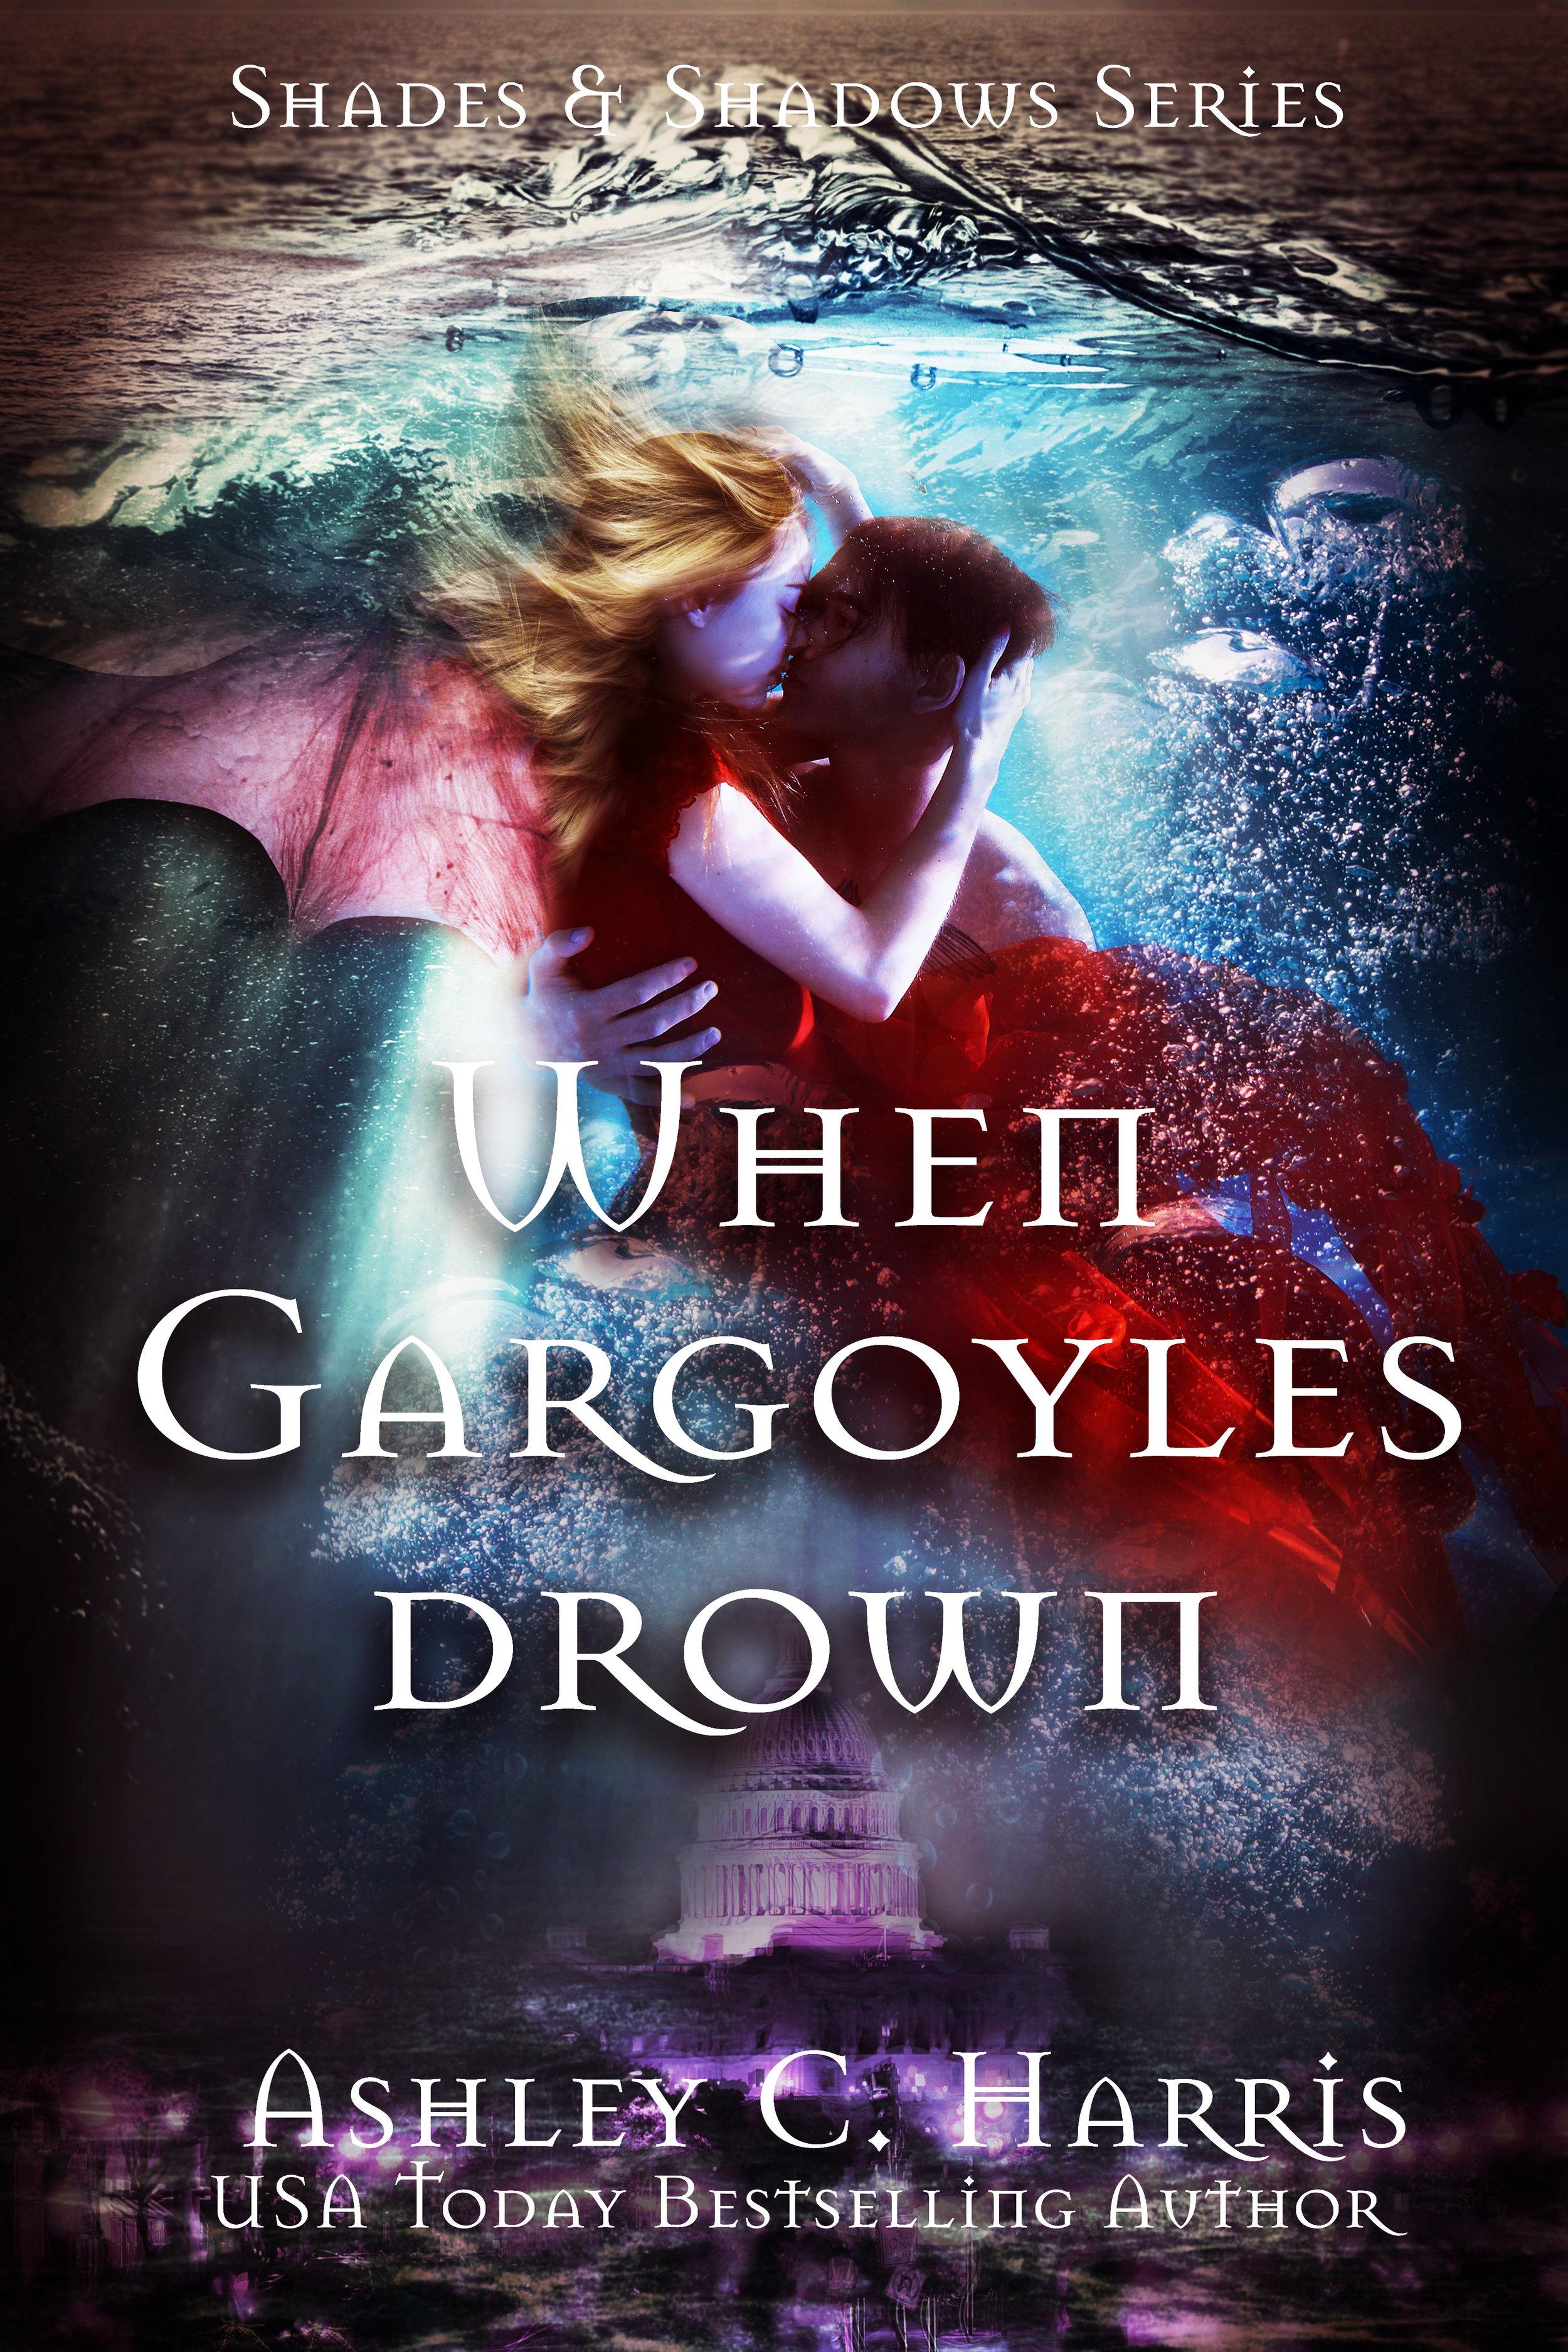 3When Gargoyles drown USA ajusted.jpg